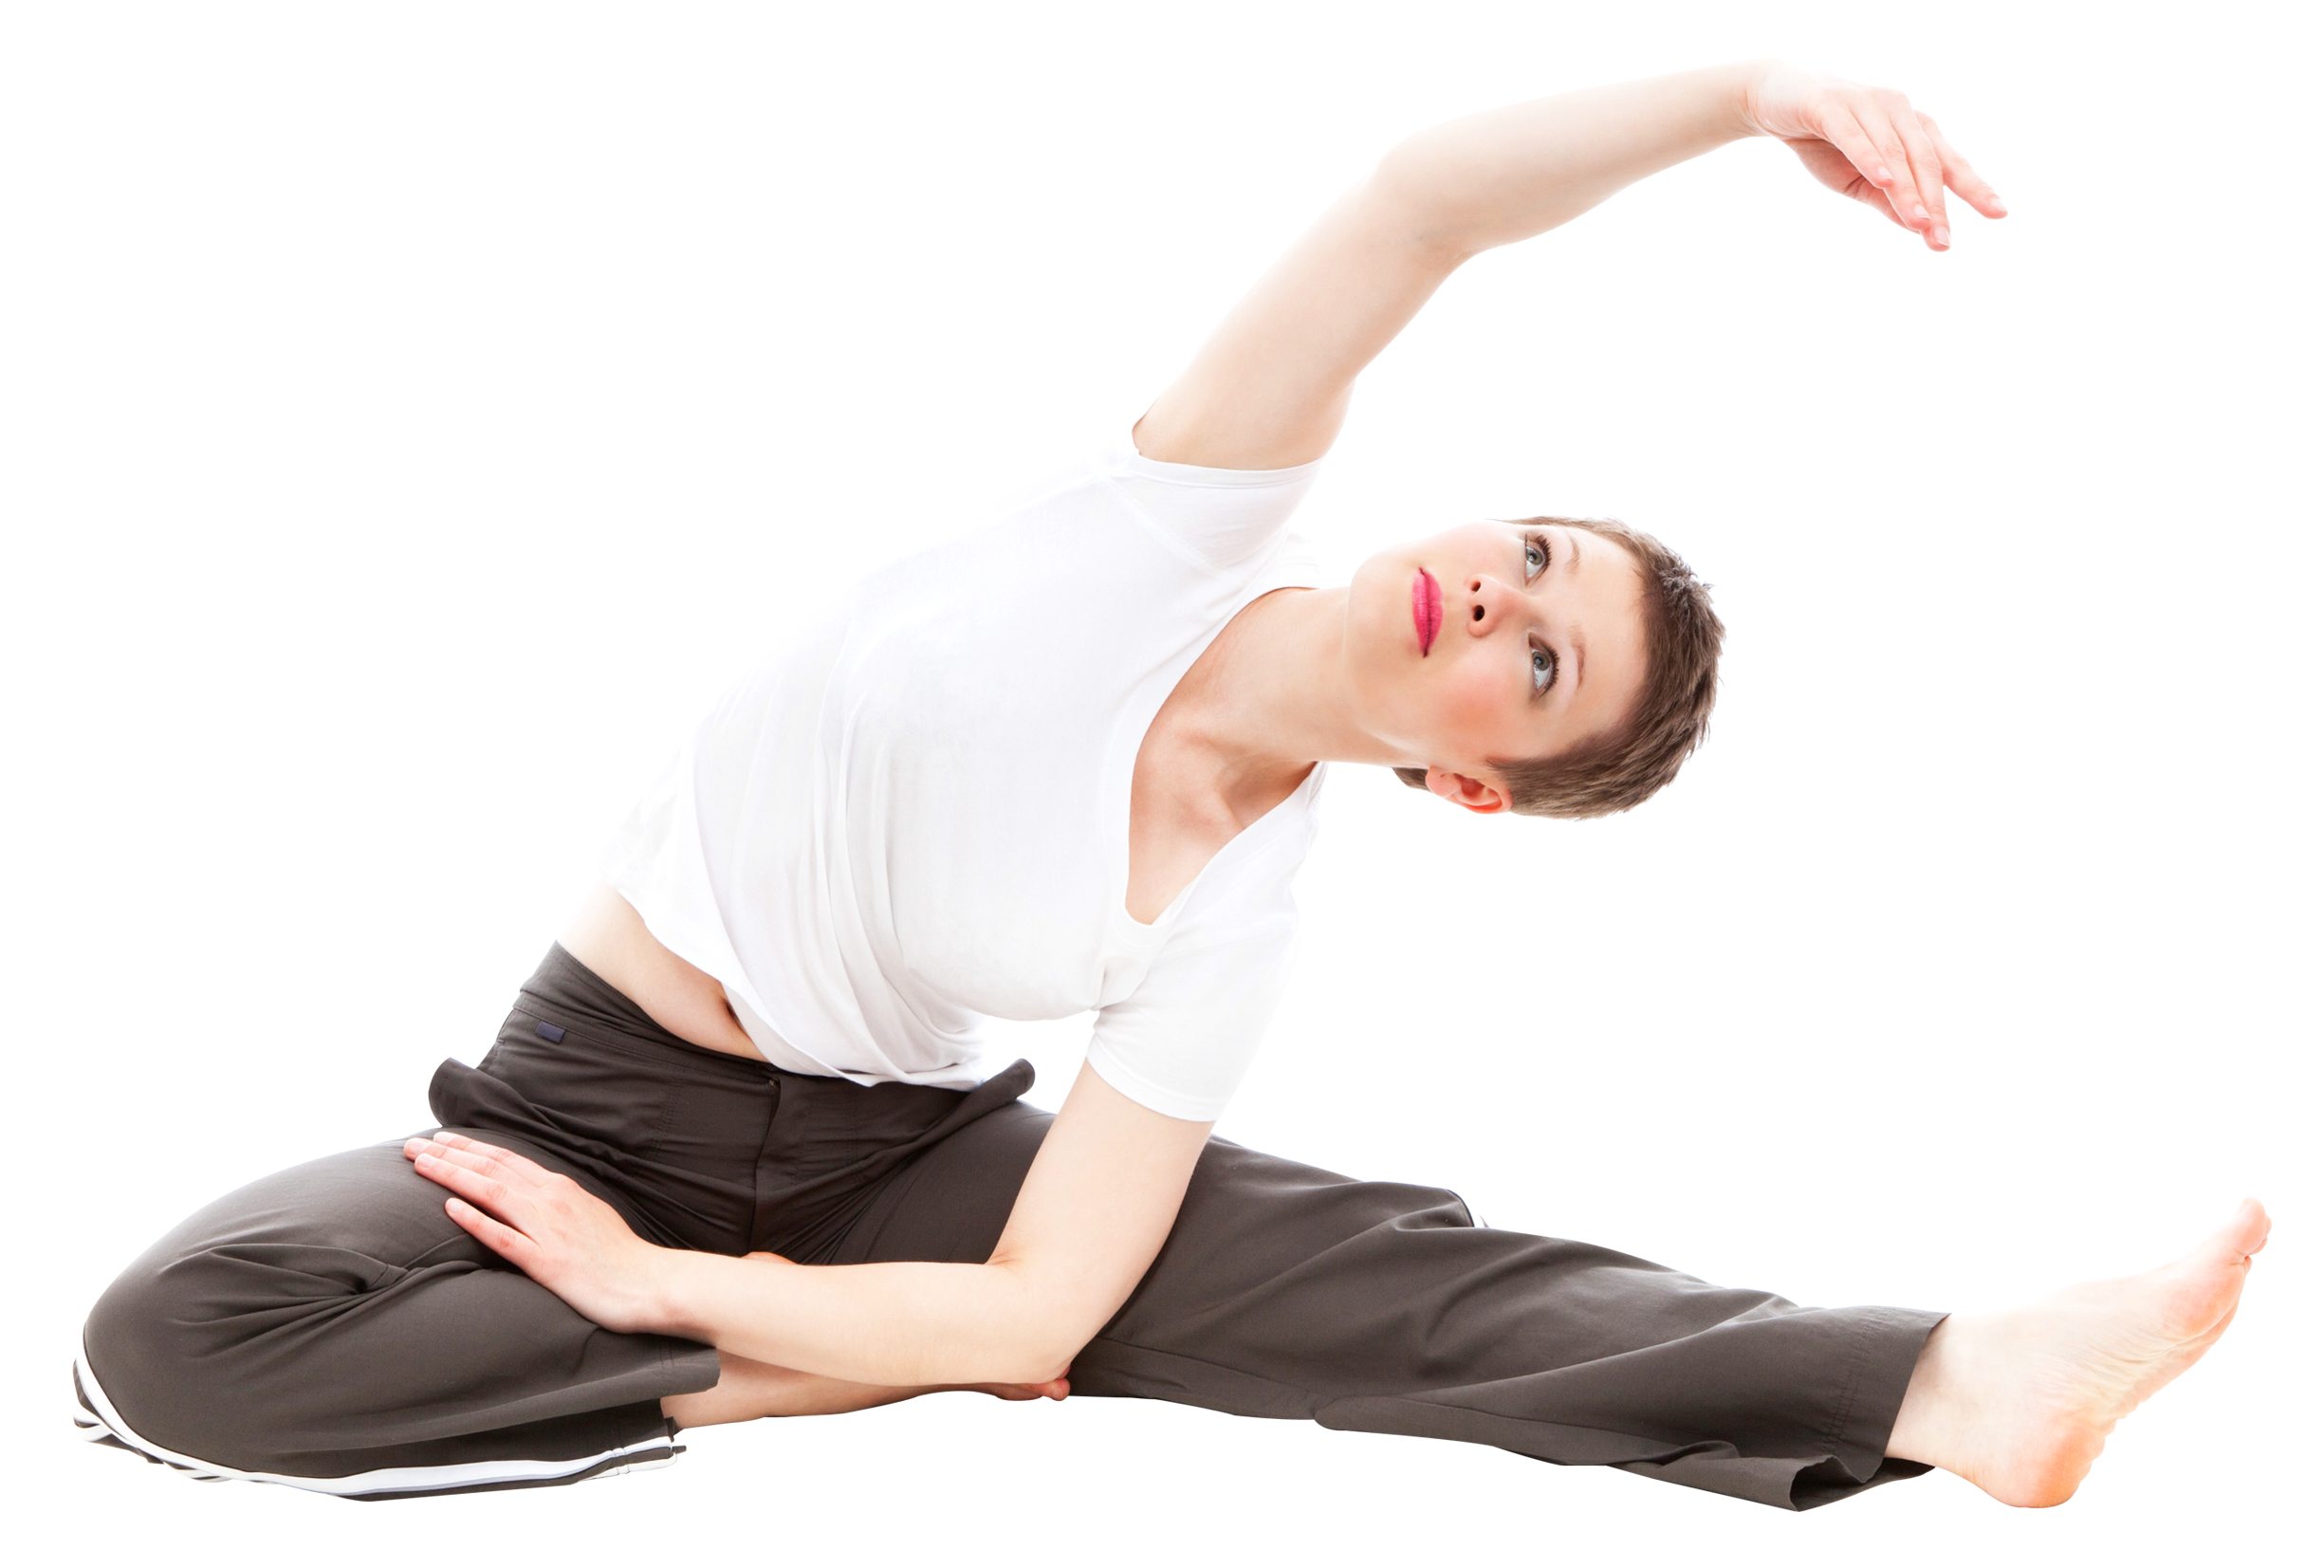 Yoga PNG Images Transparent Free Download.